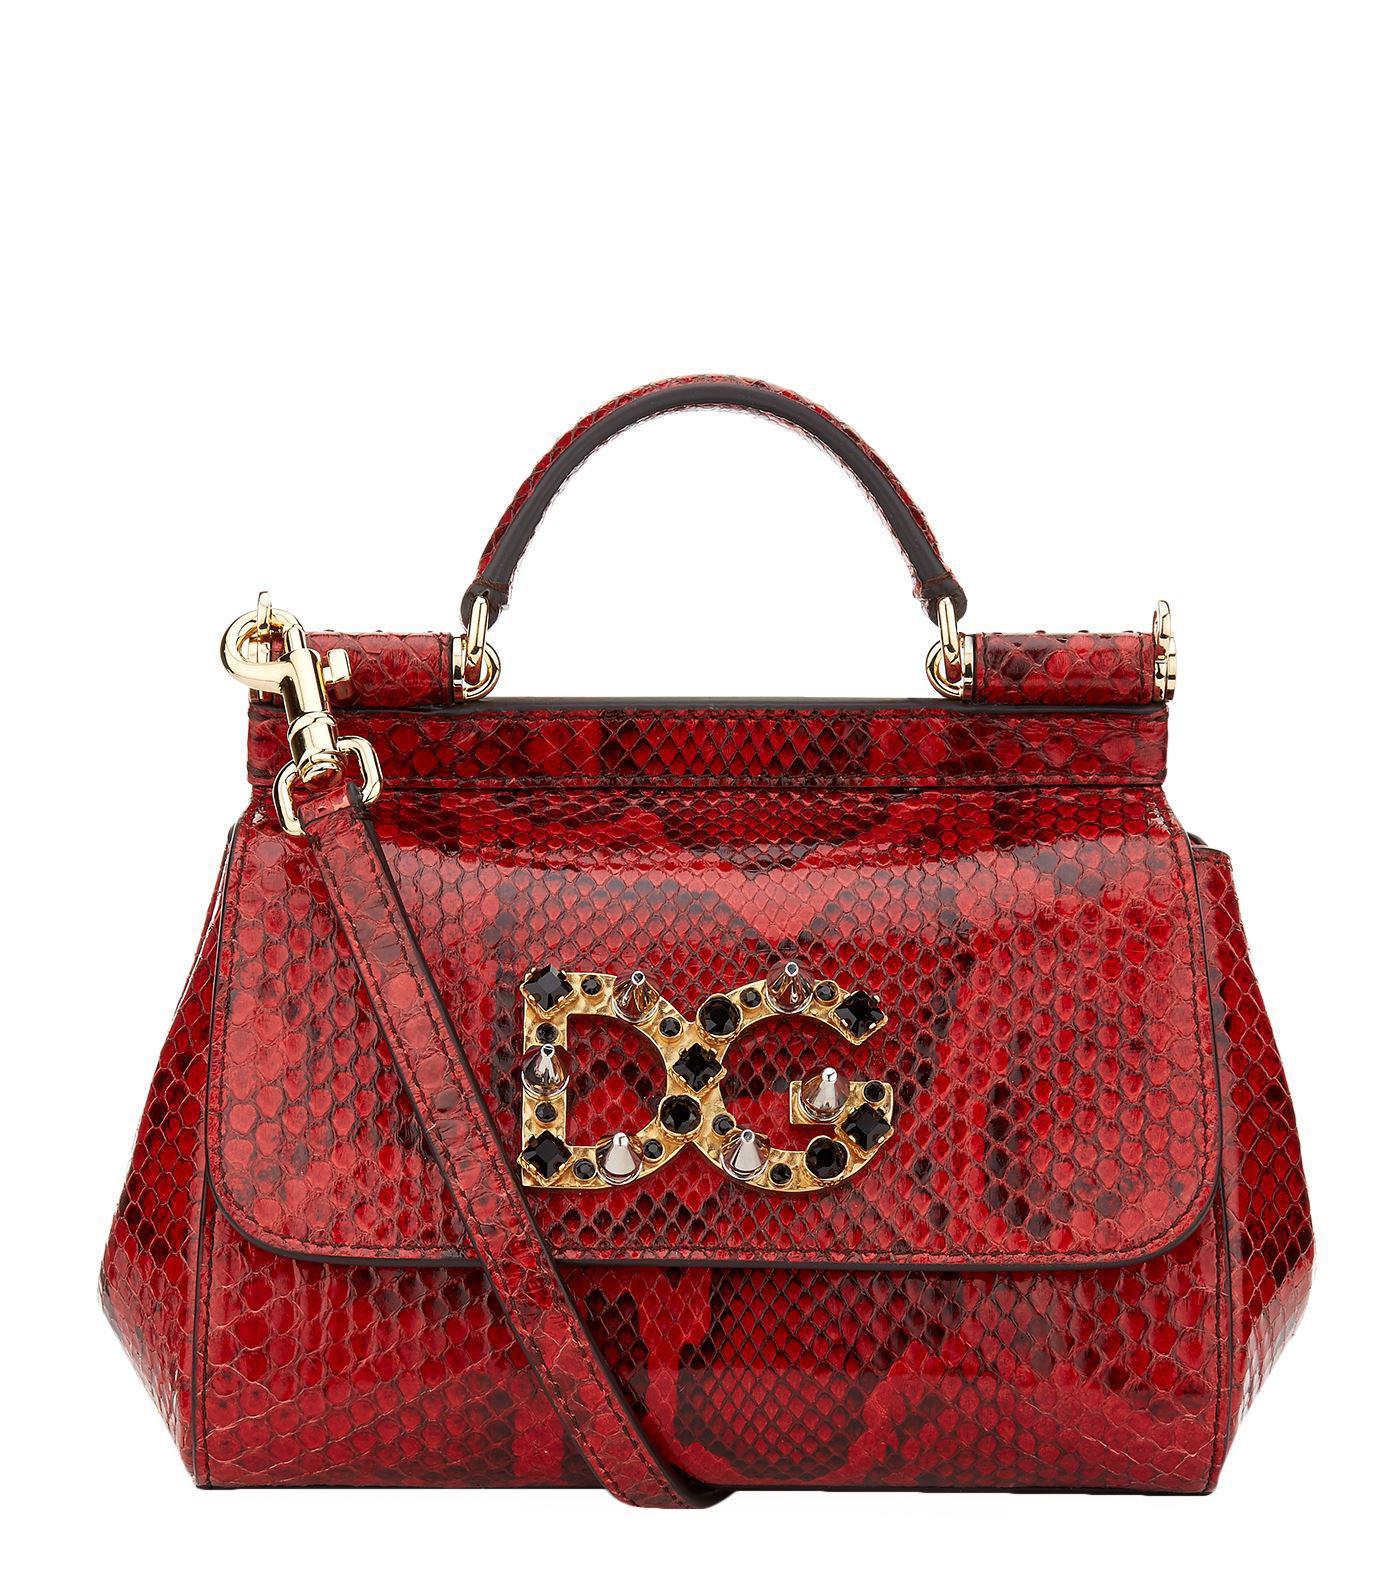 b84b8d6cae21 Lyst - Dolce   Gabbana Mini Sicily Embellished Python Shoulder Bag ...